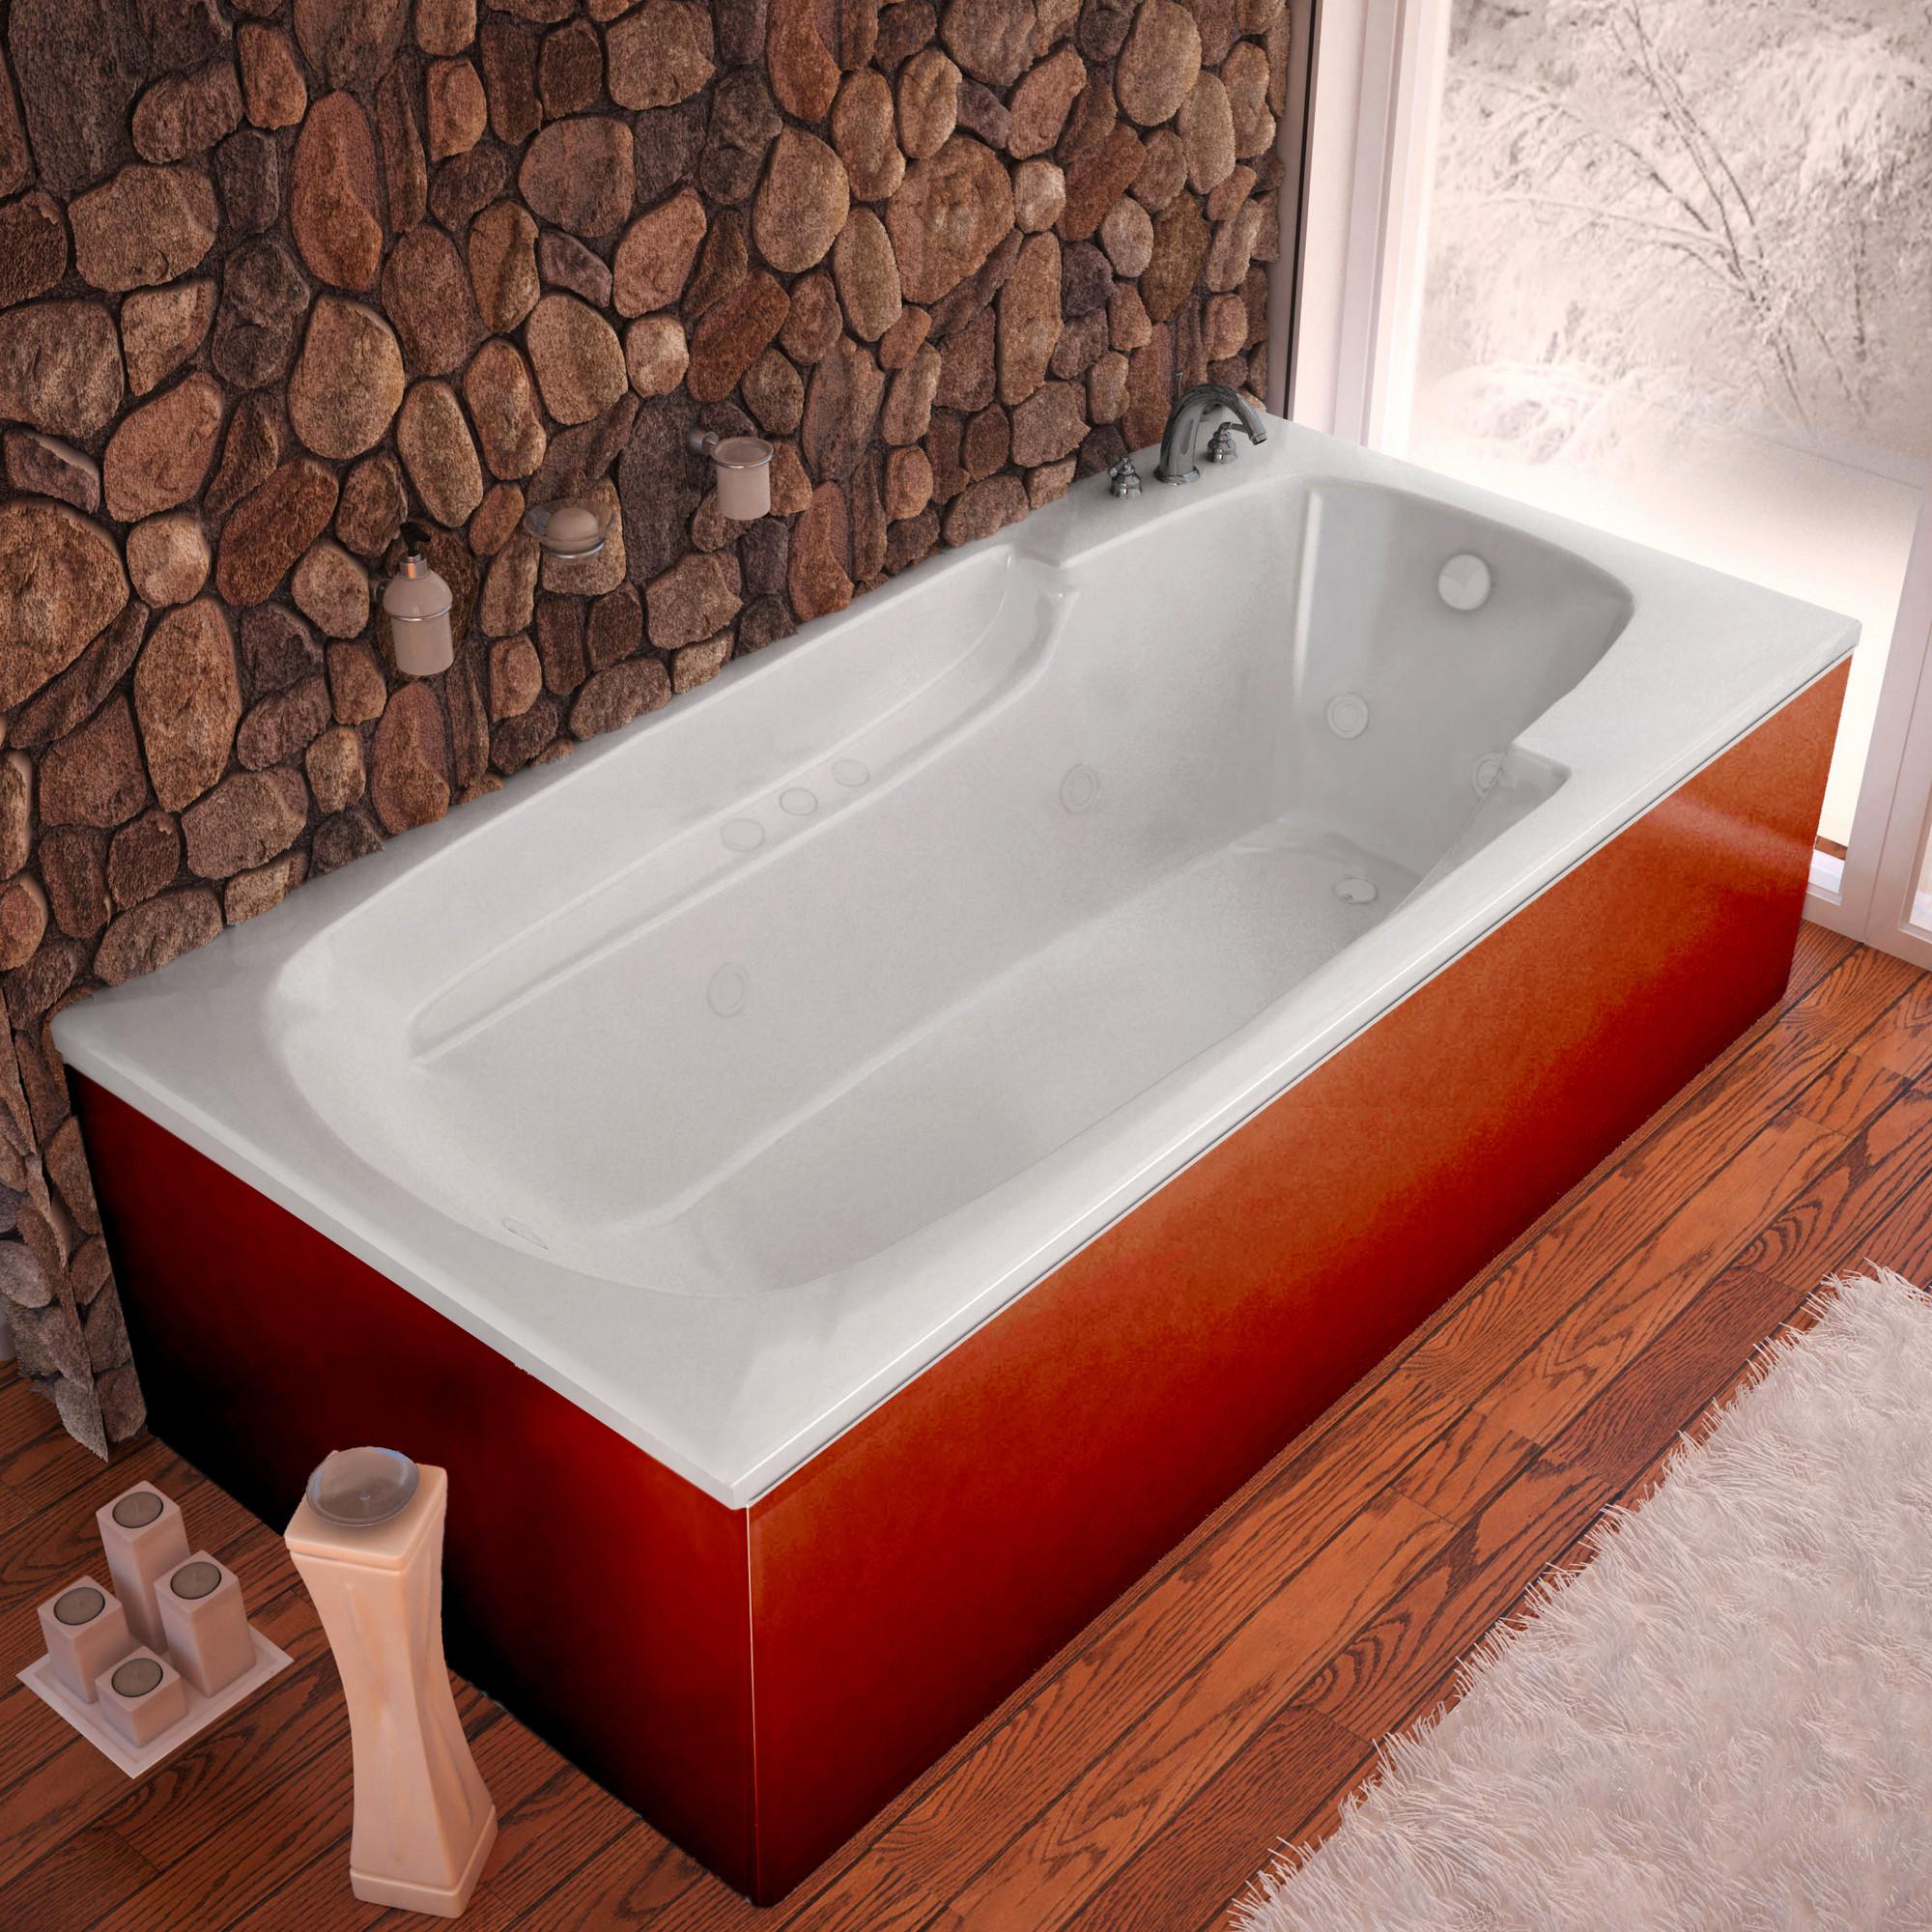 MediTub 4272EWL Atlantis Eros Whirlpool Jetted Bathtub With Left Drain